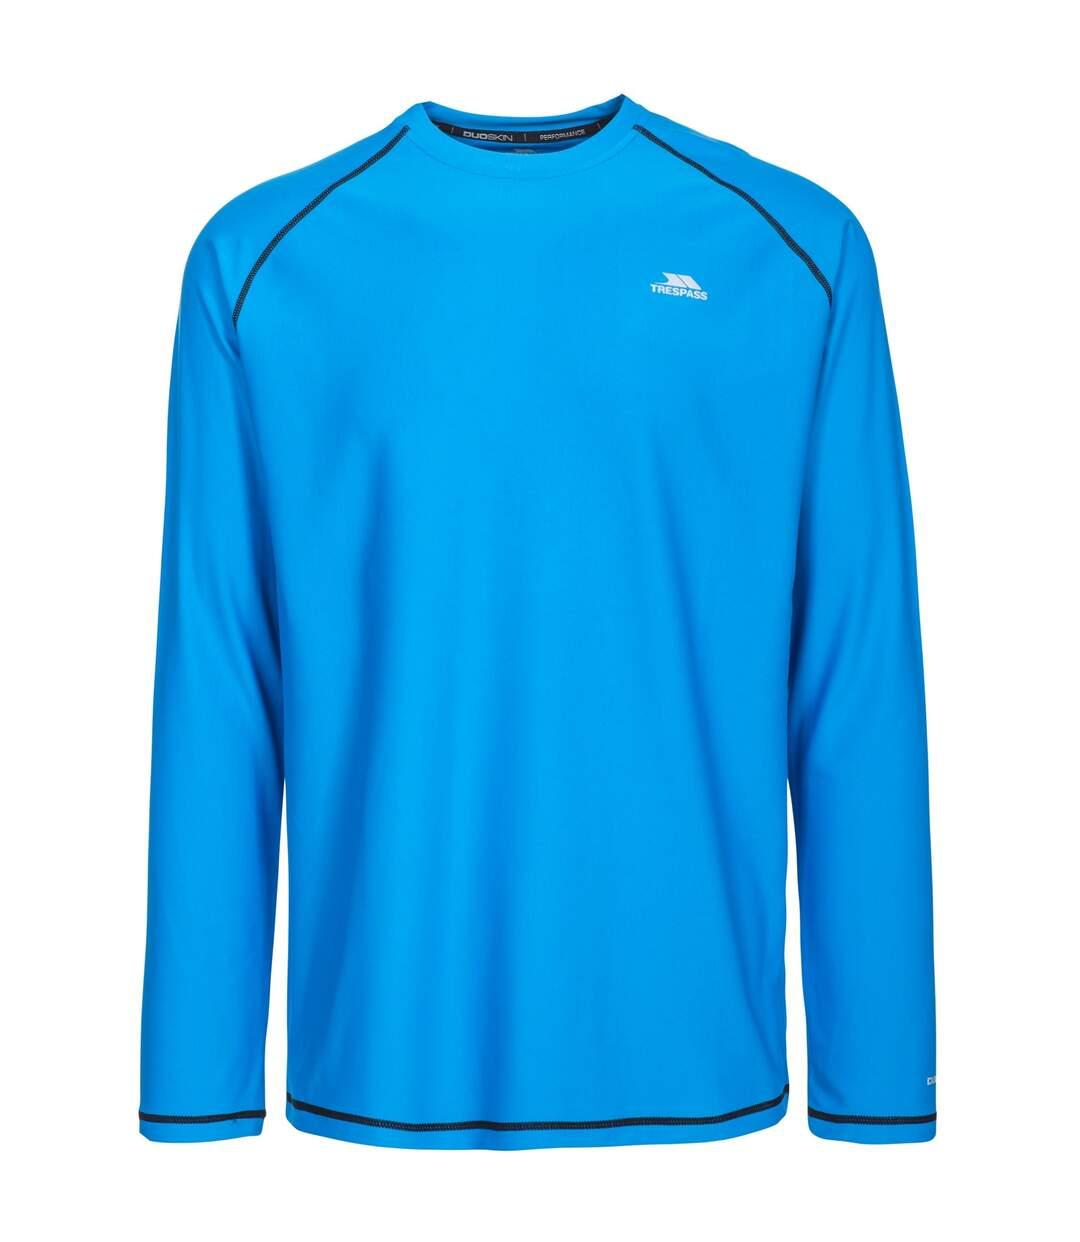 Trespass Mens Burrows Long Sleeve Active Top (Bright Blue) - UTTP4559